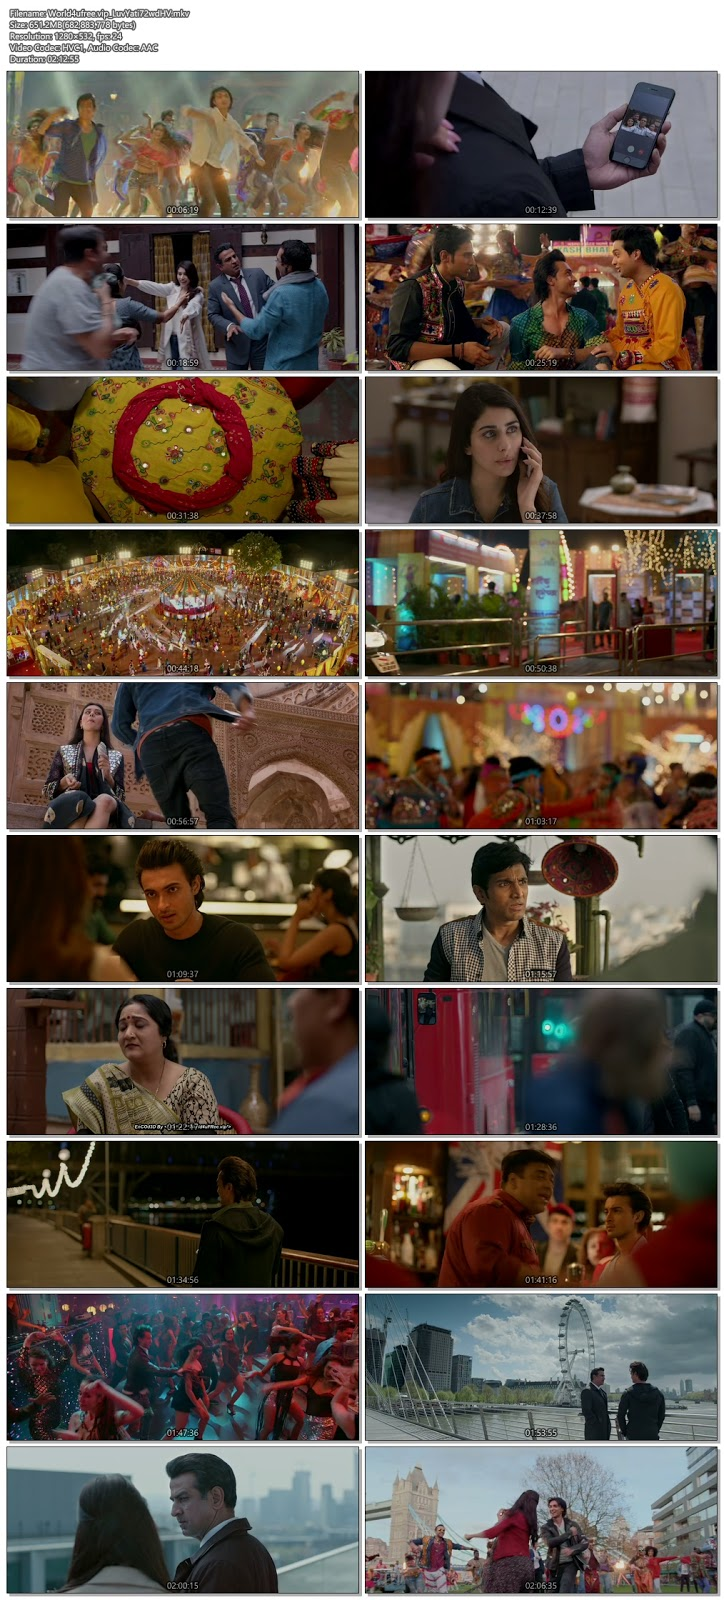 Loveyatri 2018 Hindi Movie 720p HDRip 650Mb x265 HEVC world4ufree.fun , hindi movie LoveYatri 2018 hdrip 720p bollywood movie LoveYatri 2018 720p LATEST MOVie LoveYatri 2018 720p DVDRip NEW MOVIE LoveYatri 2018 720p WEBHD 700mb free download or watch online at world4ufree.fun